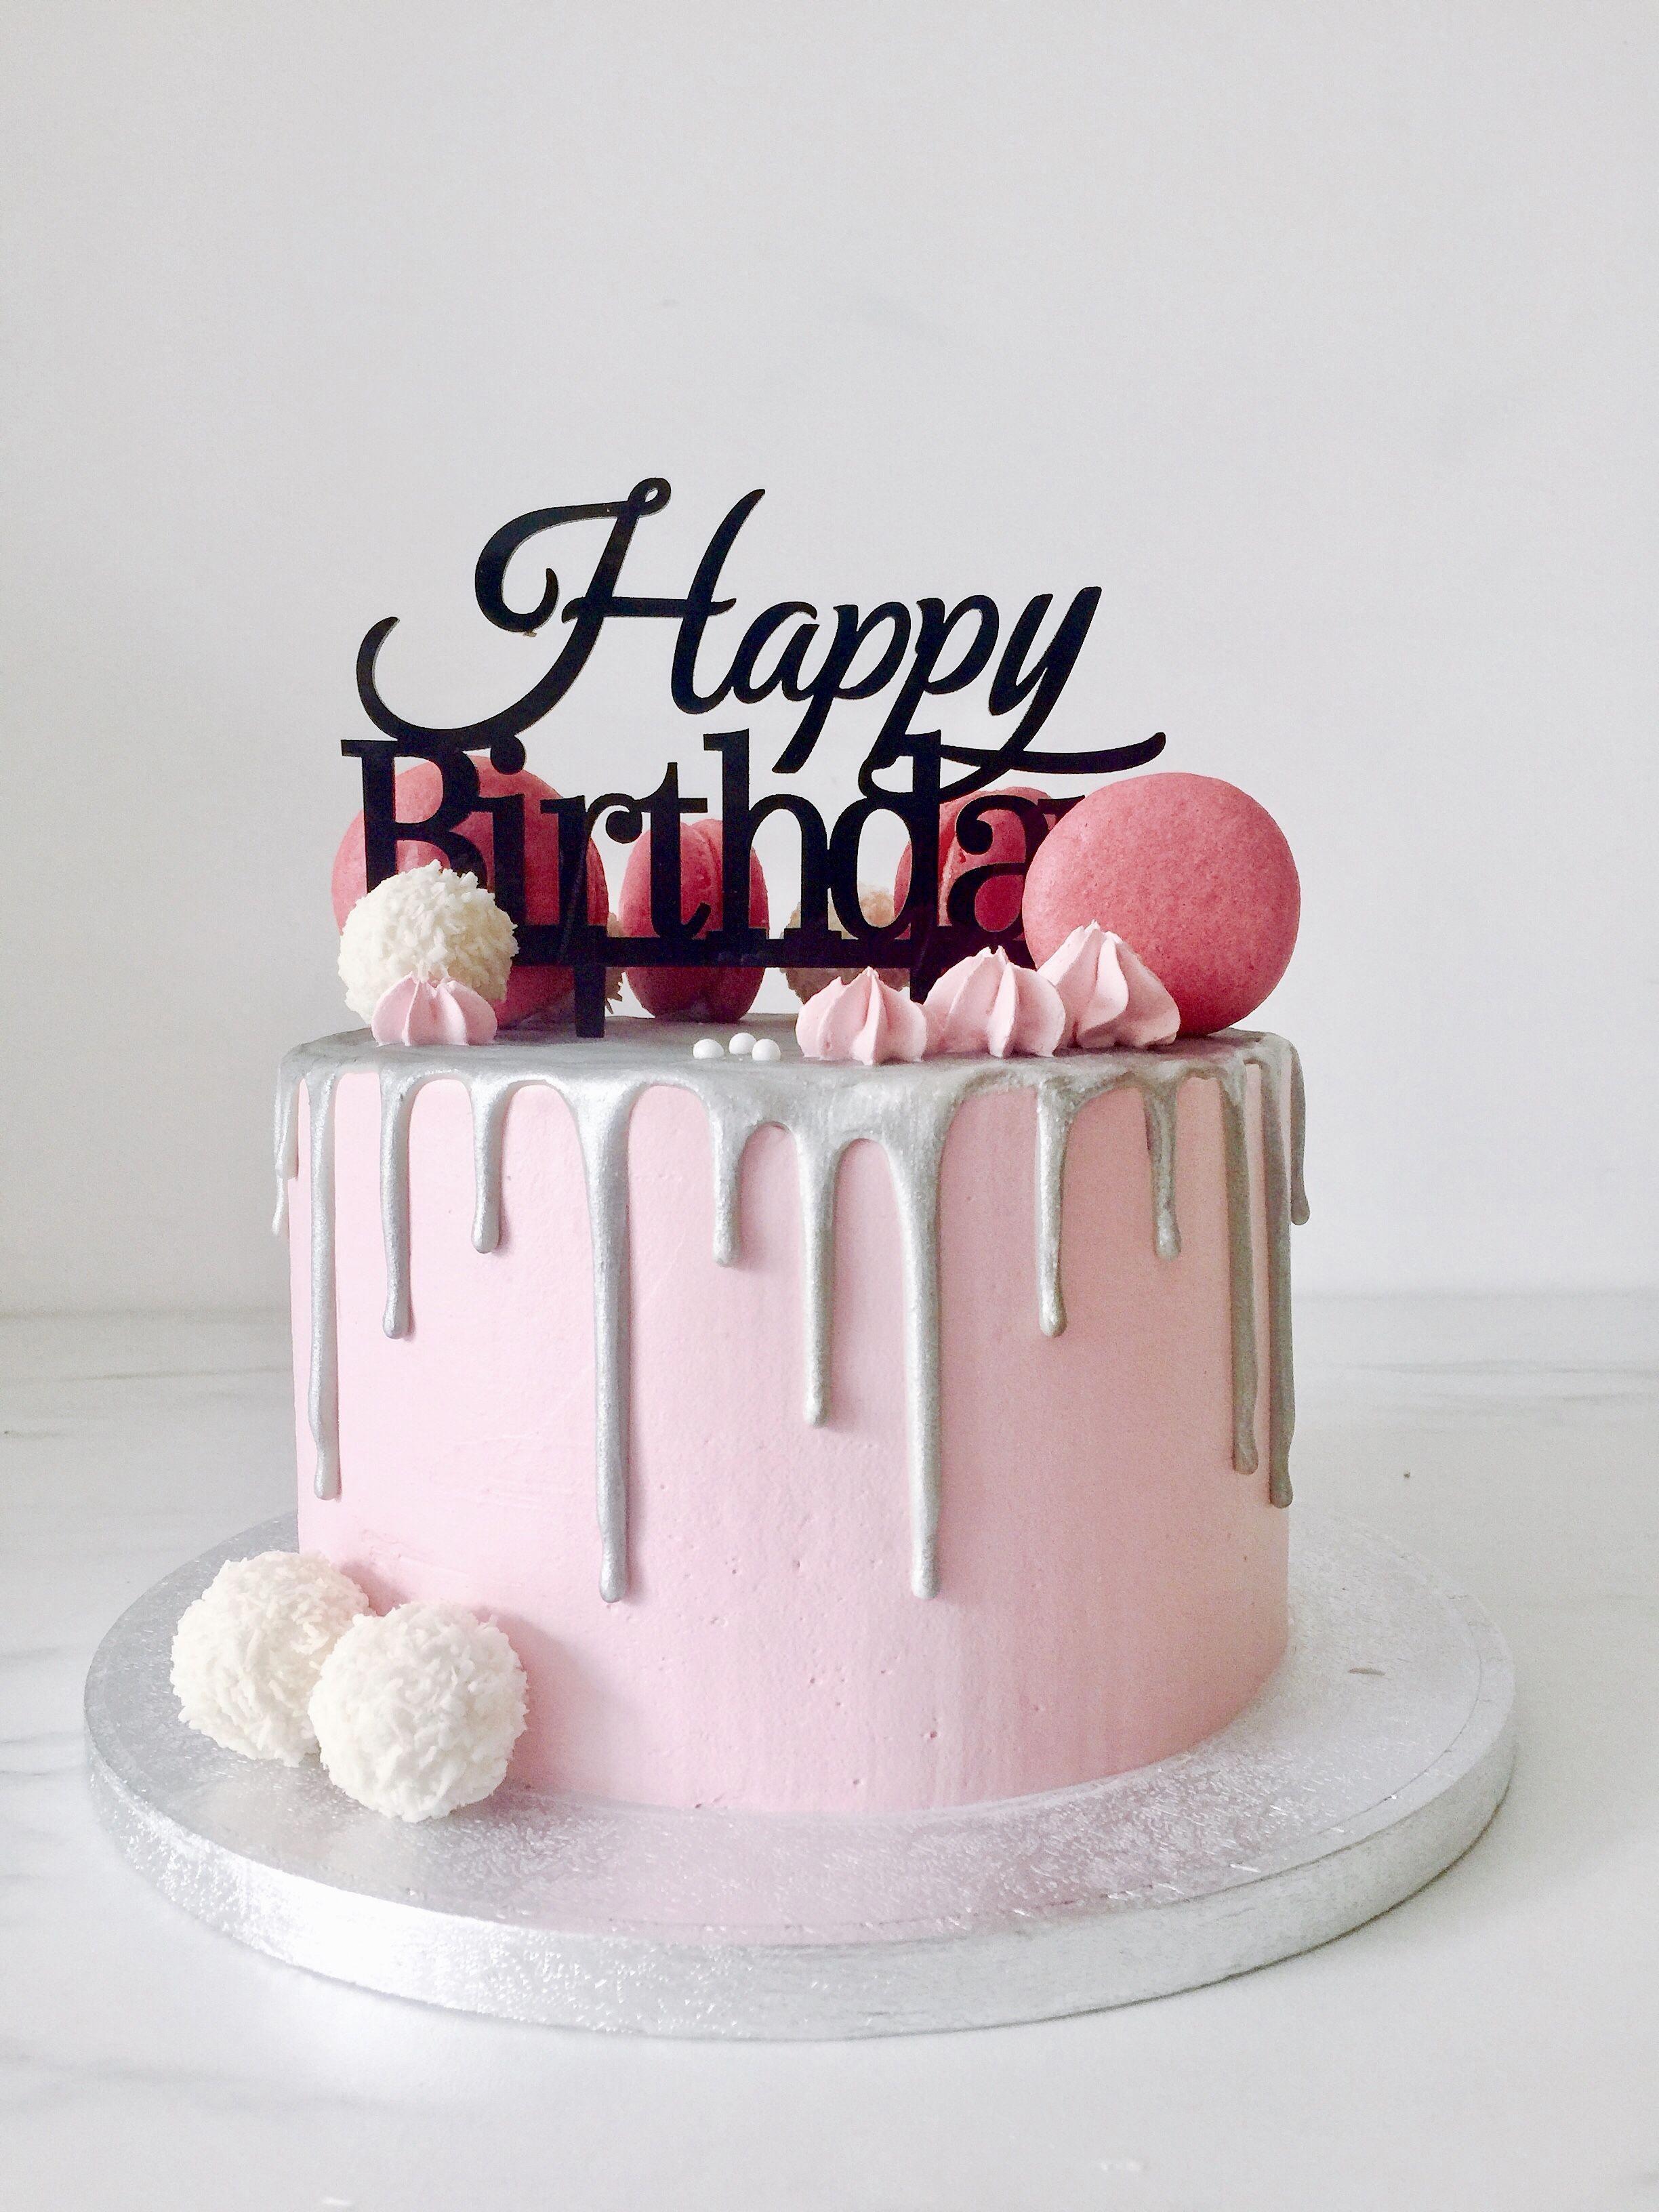 Salmon And Mozzarella Cake Clean Eating Snacks Recipe Sweet 16 Birthday Cake 25th Birthday Cakes Sweet 16 Cakes